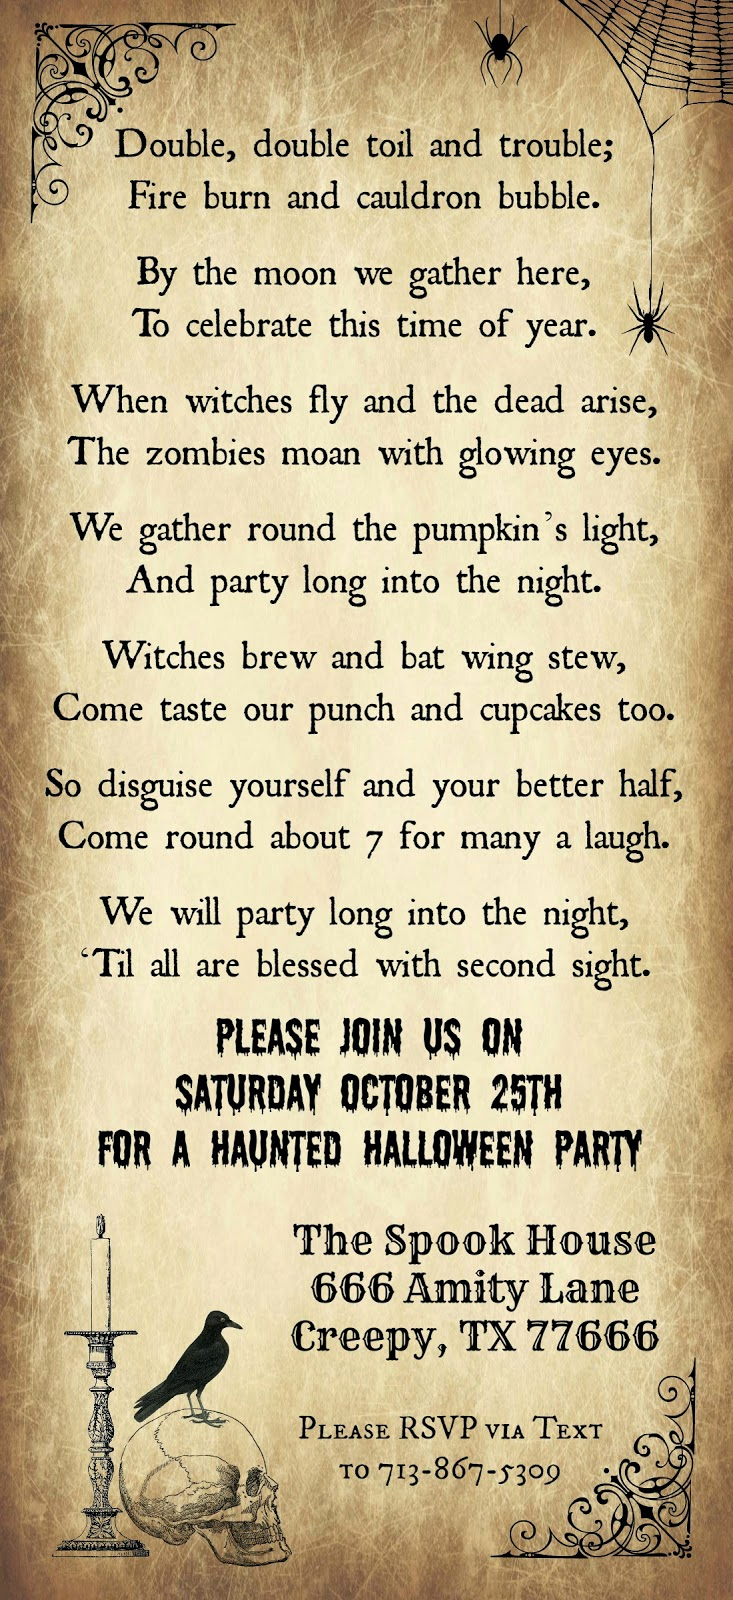 Halloween Birthday Party Invitations New Crafty In Crosby Halloween Party Invitation 2014